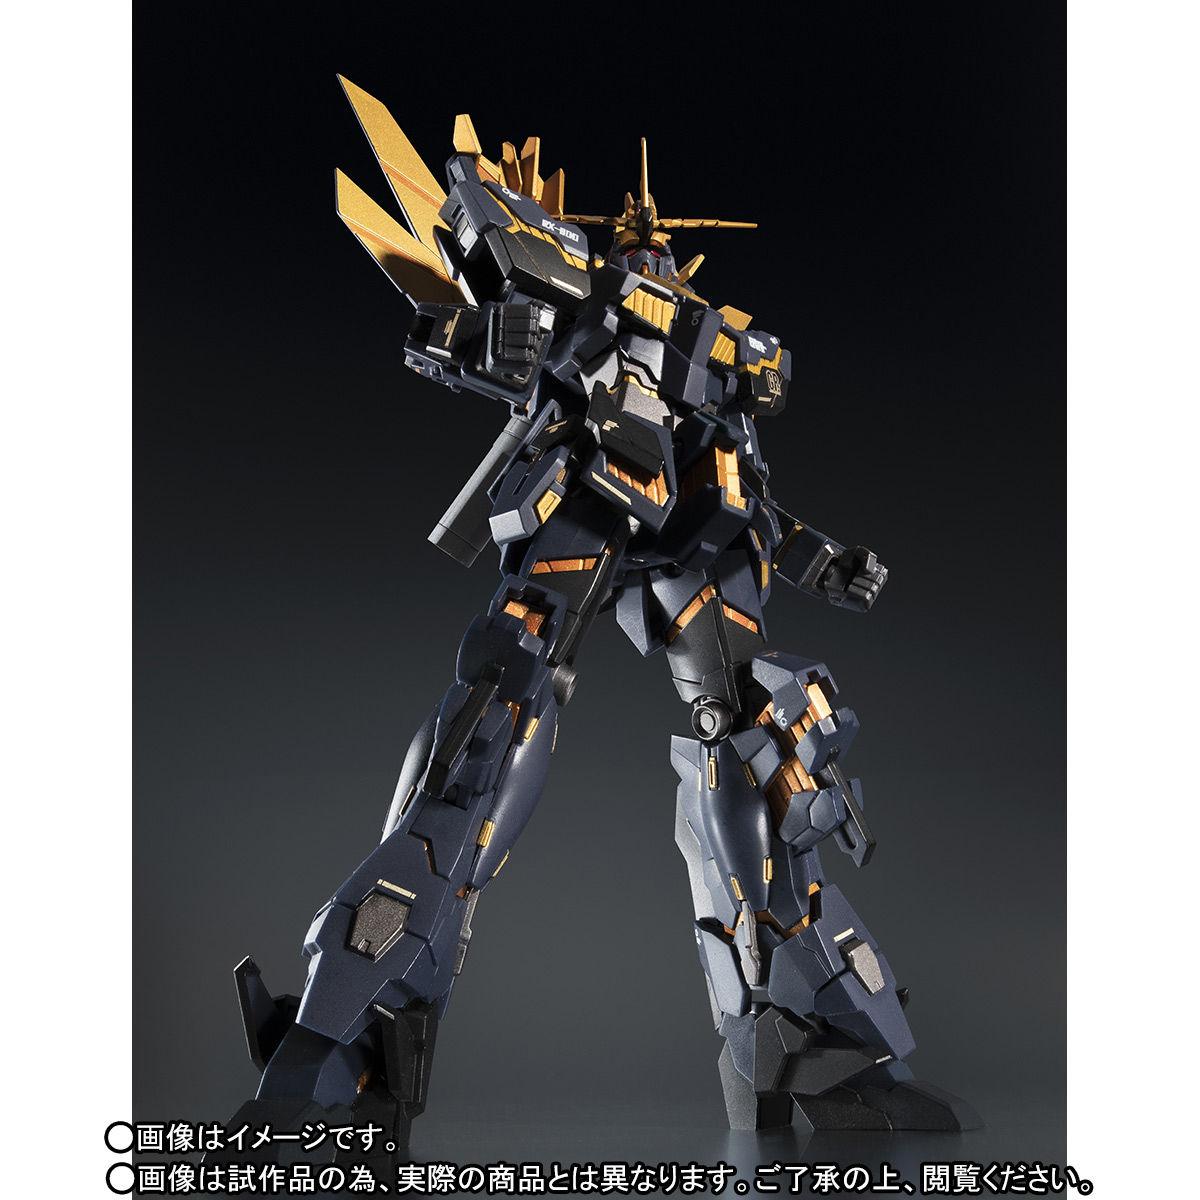 ROBOT魂〈SIDE MS〉『バンシィ・ノルン SPパック リアルマーキングVer.』可動フィギュア-003